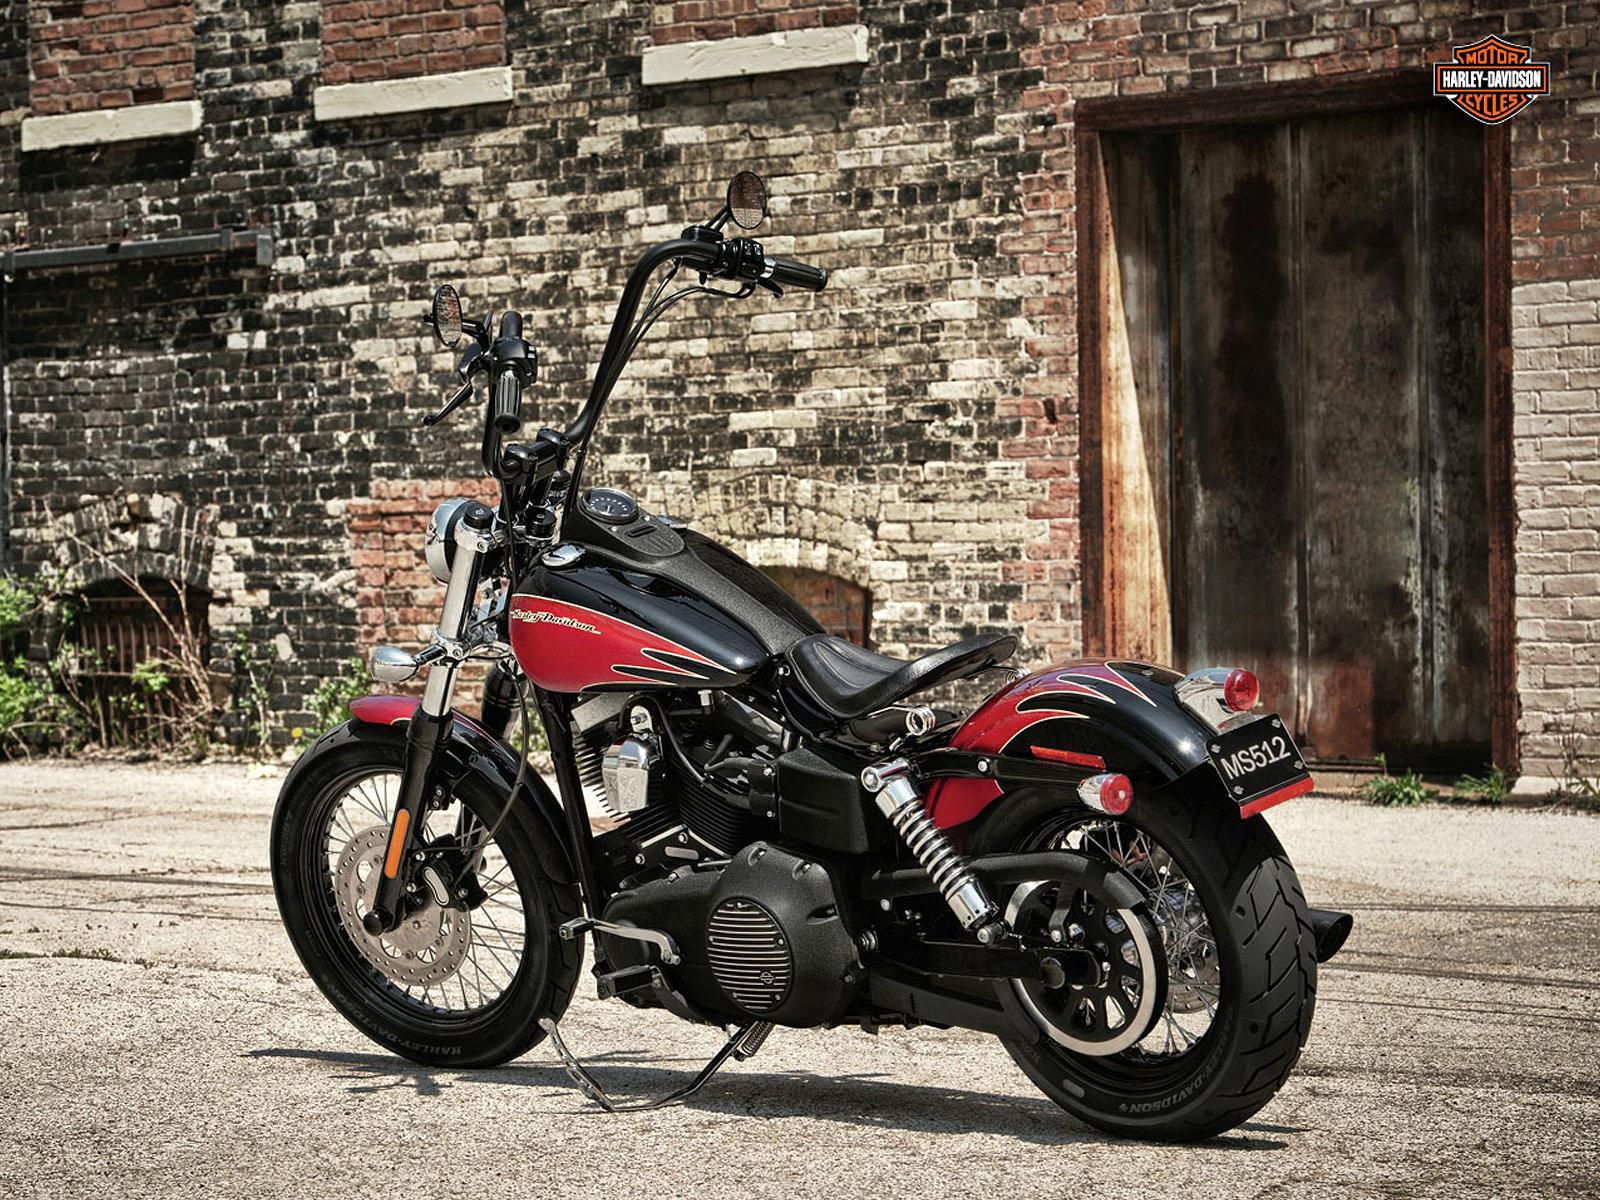 Harley Davidson 2012: 2012 FXDB Dyna Street Bob Harley-Davidson Pictures, Review